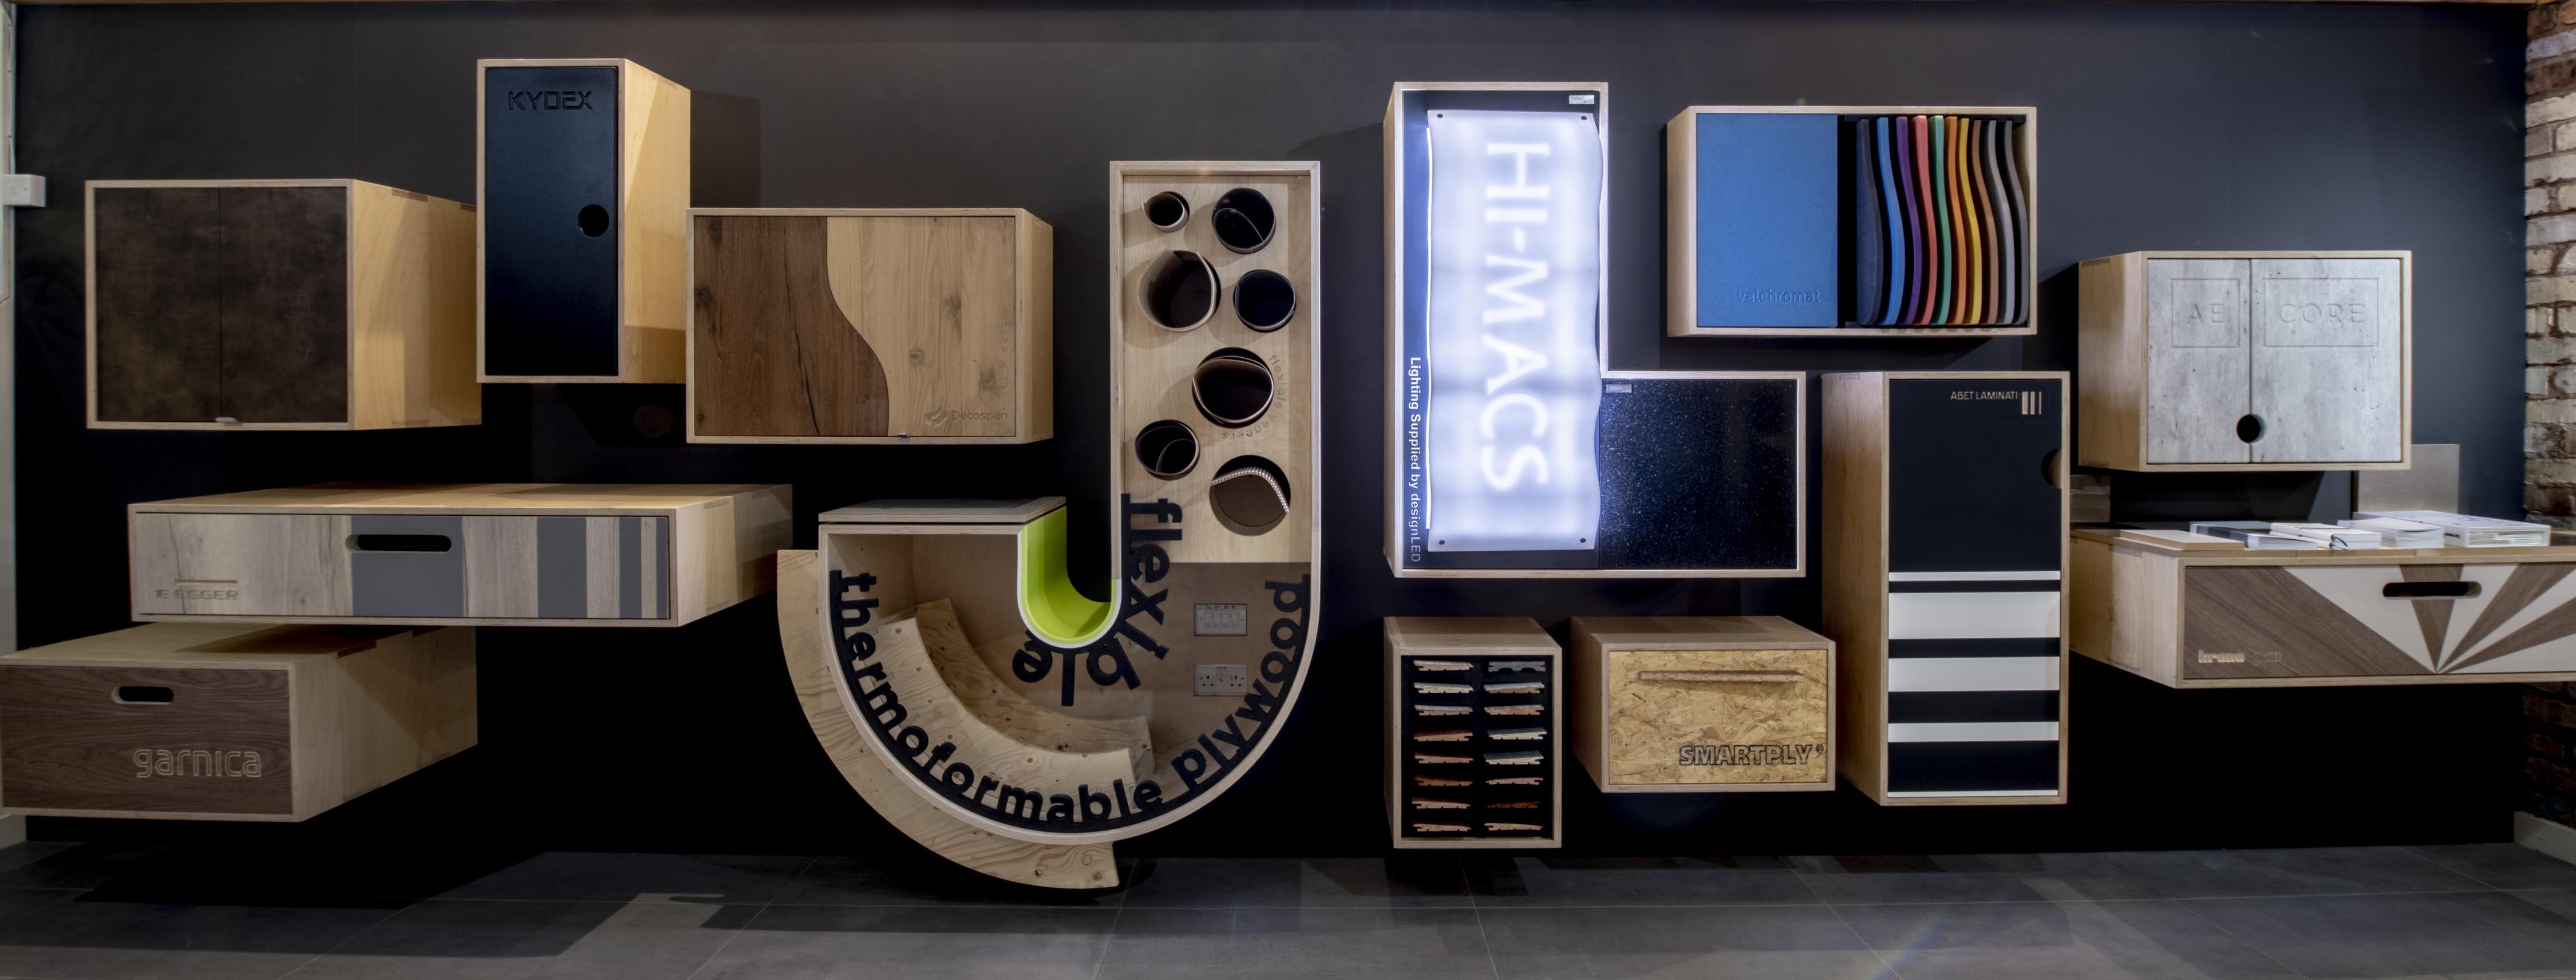 Bespoke Cabinets strip